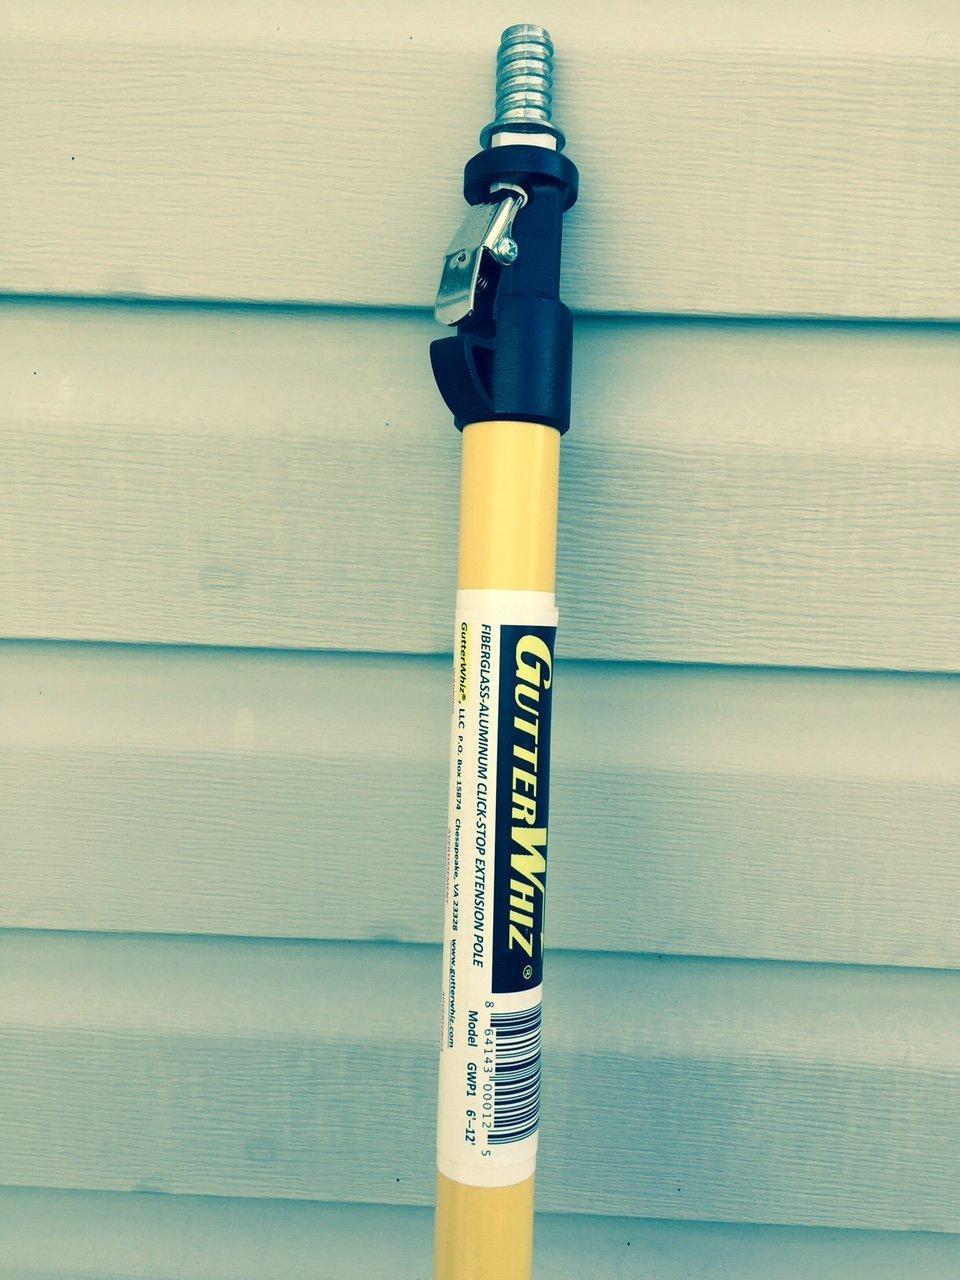 Gutterwhiz Extension Pole Best Gutter Cleaning Tool